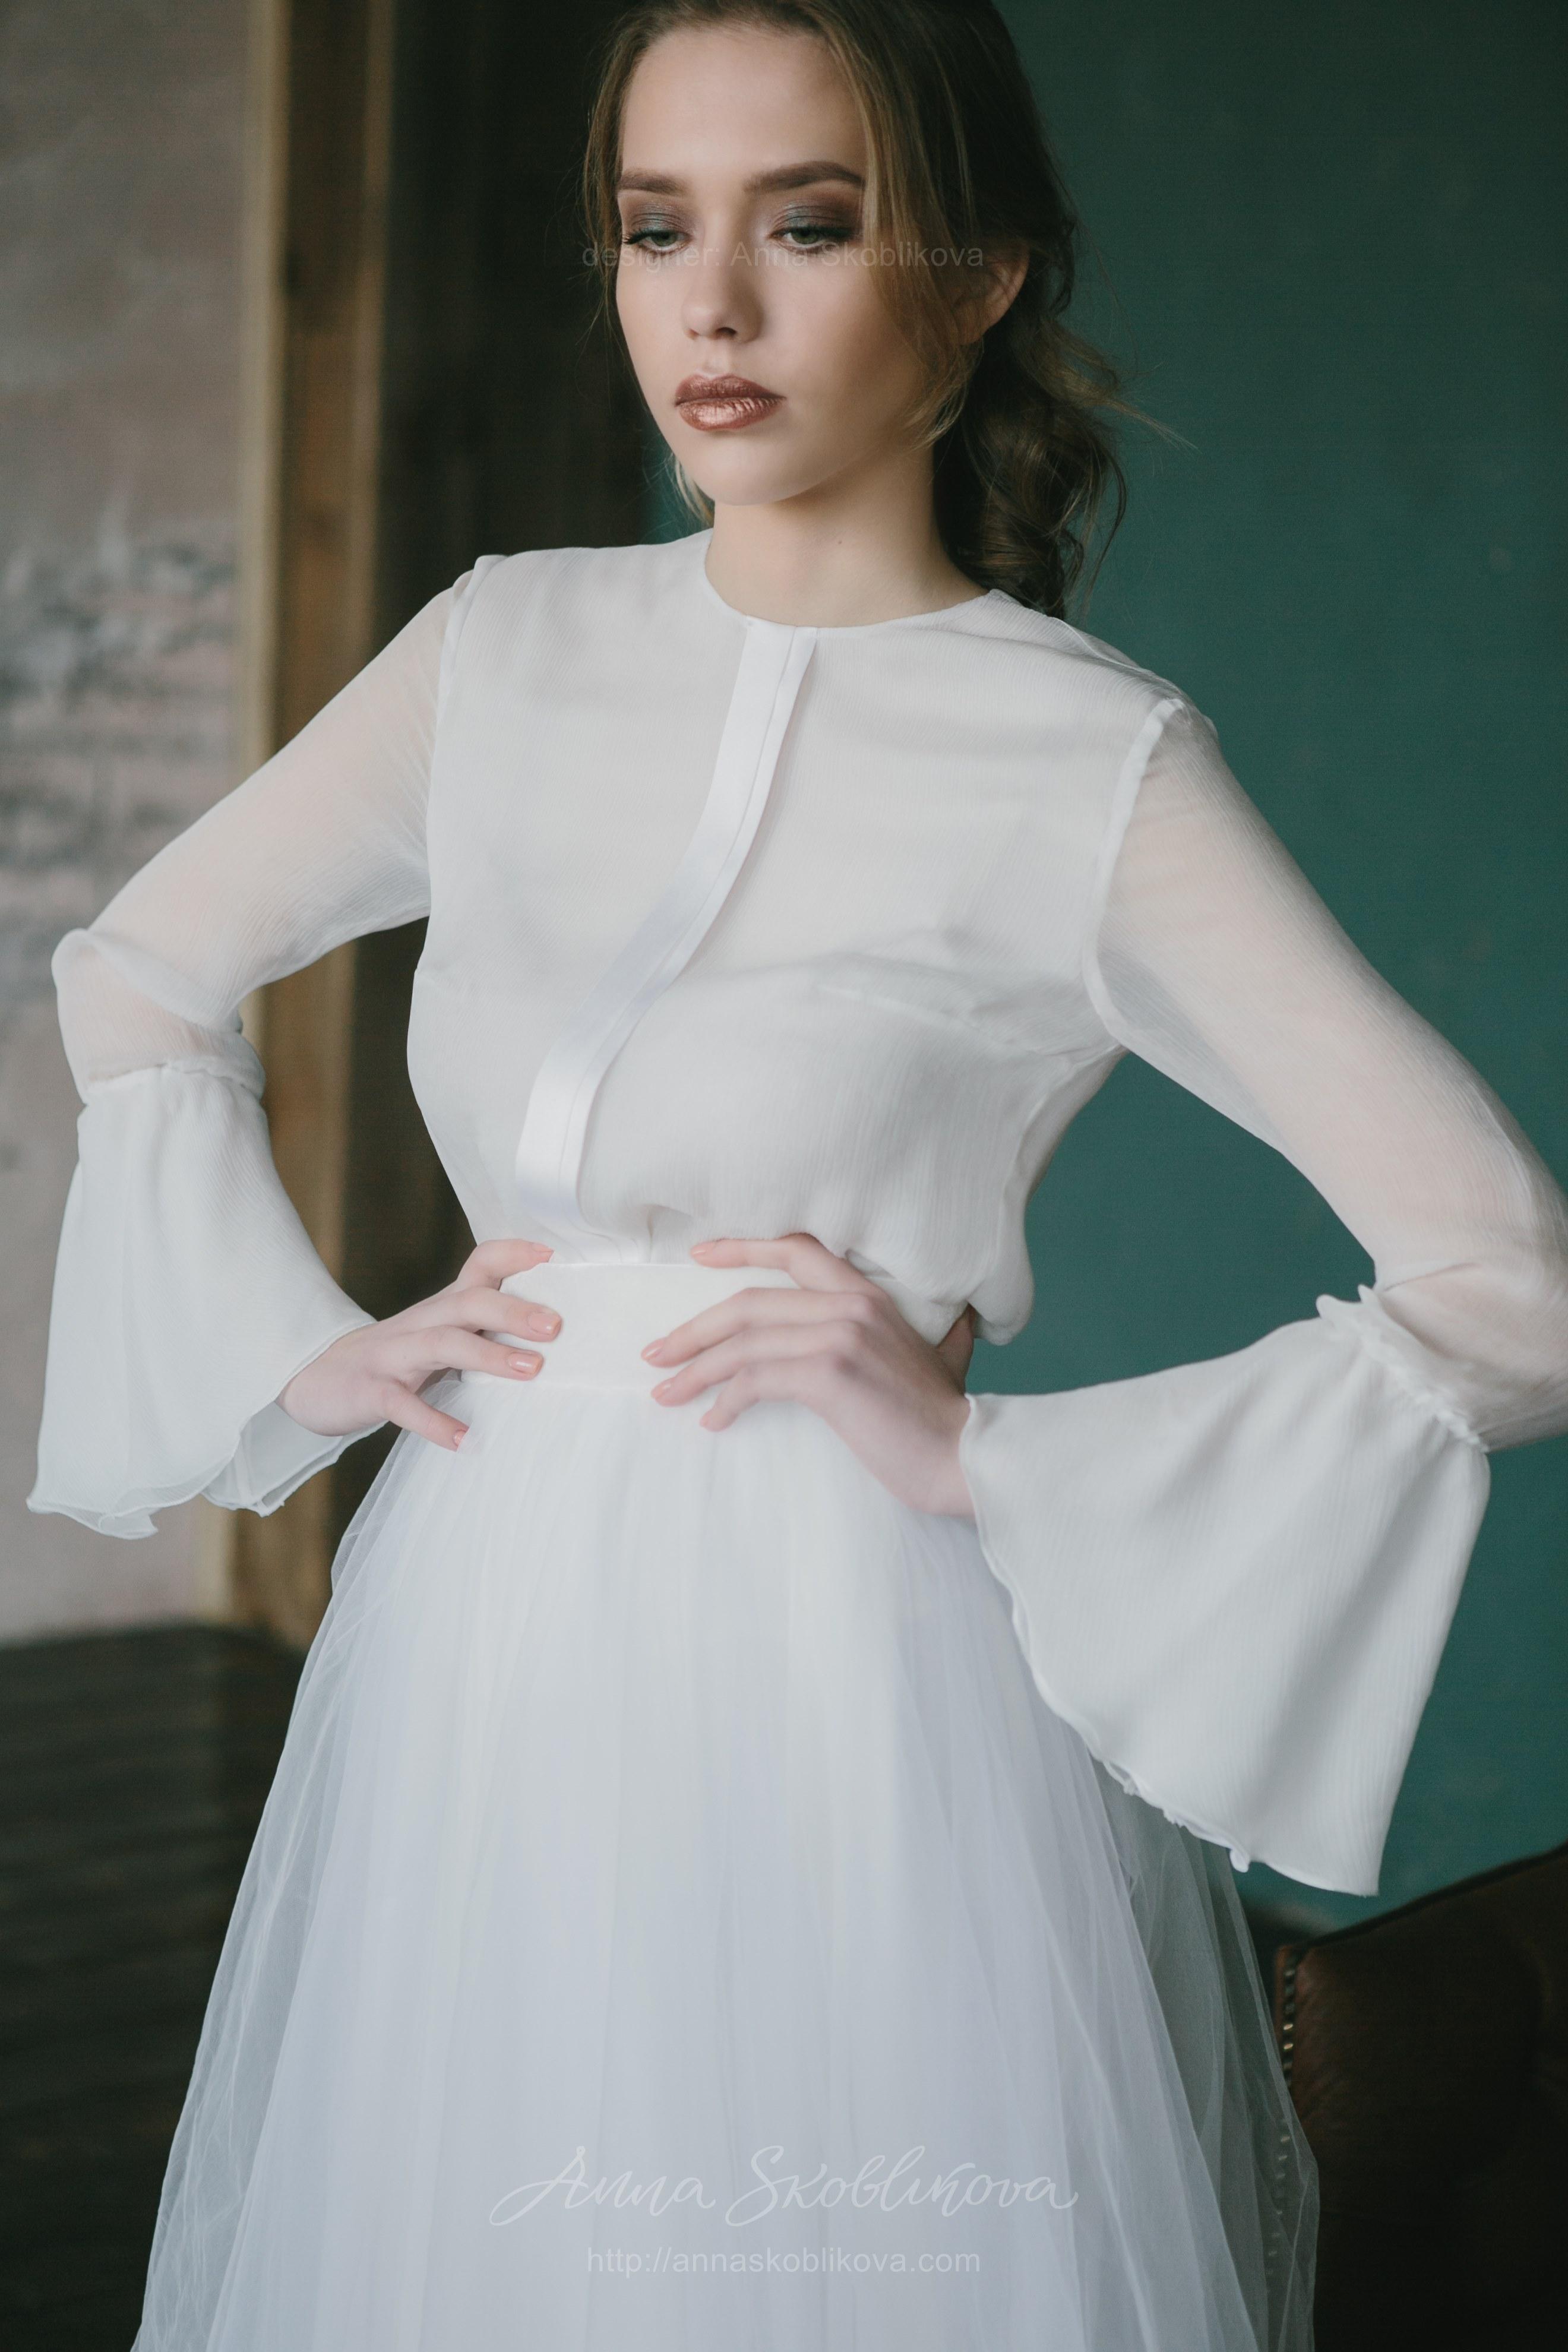 Блузка и юбка на свою свадьбу фото